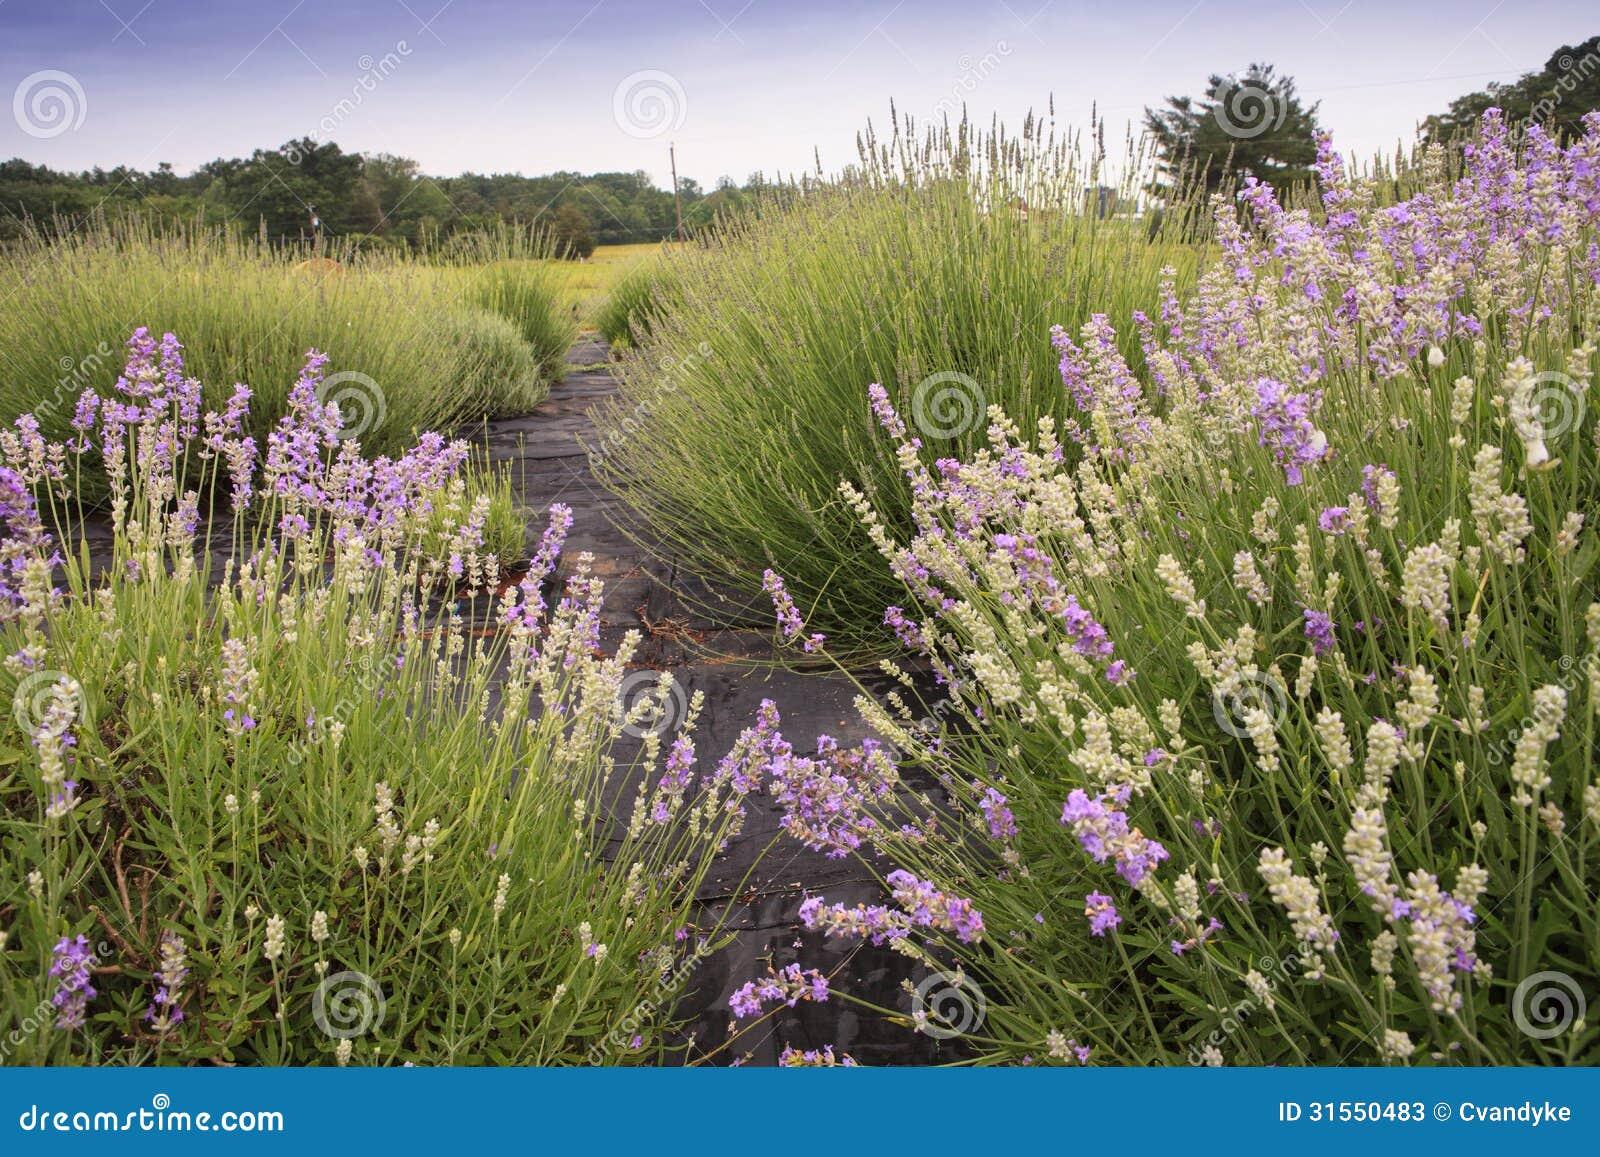 lavendar field farm catlett virginia stock photos image